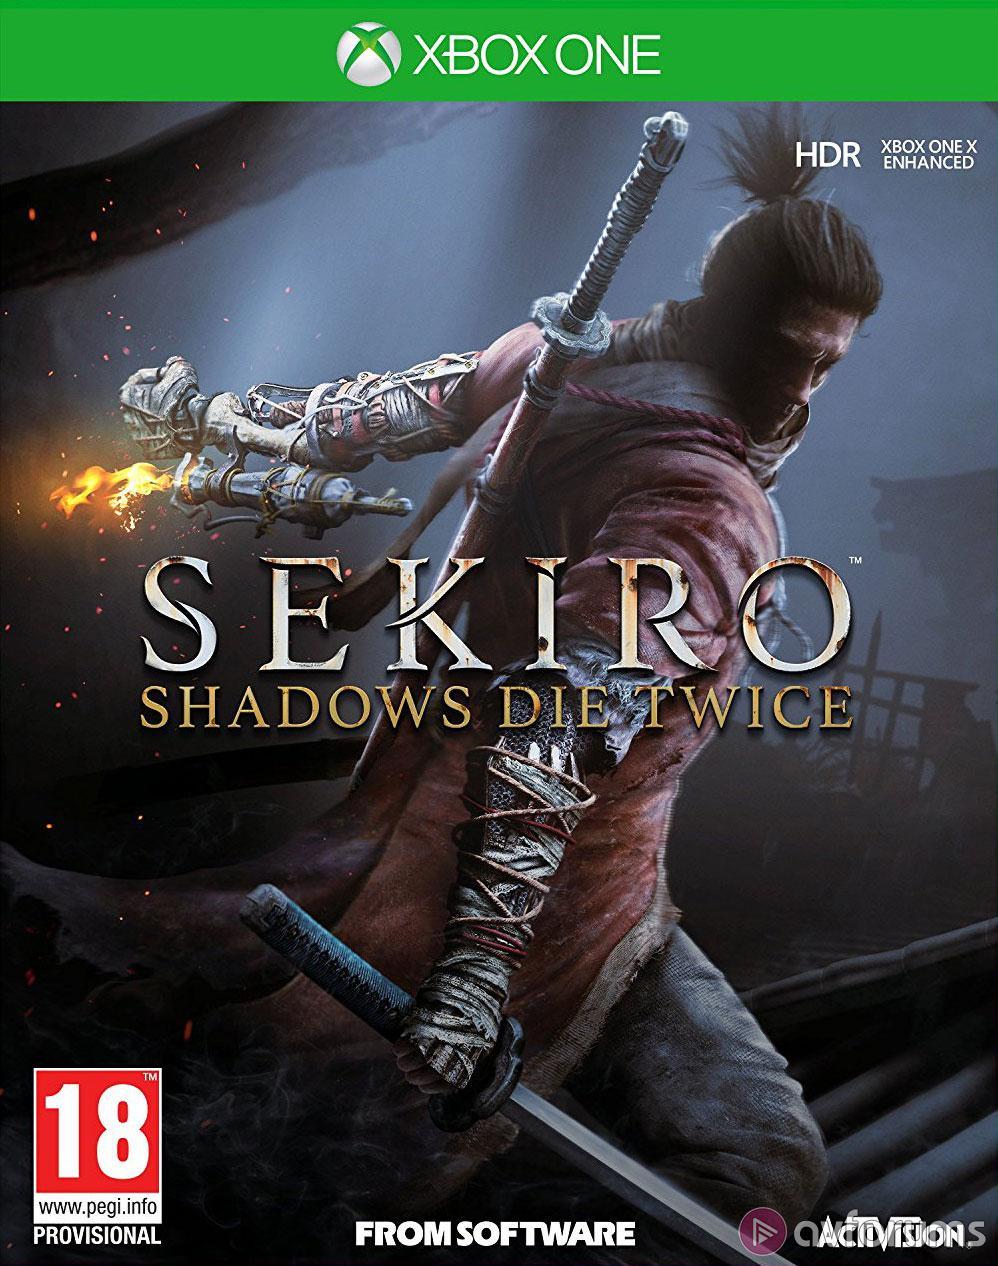 New Xbox One Games 2019 Sekiro: Shadows Die Twice Xbox One Game   AVForums